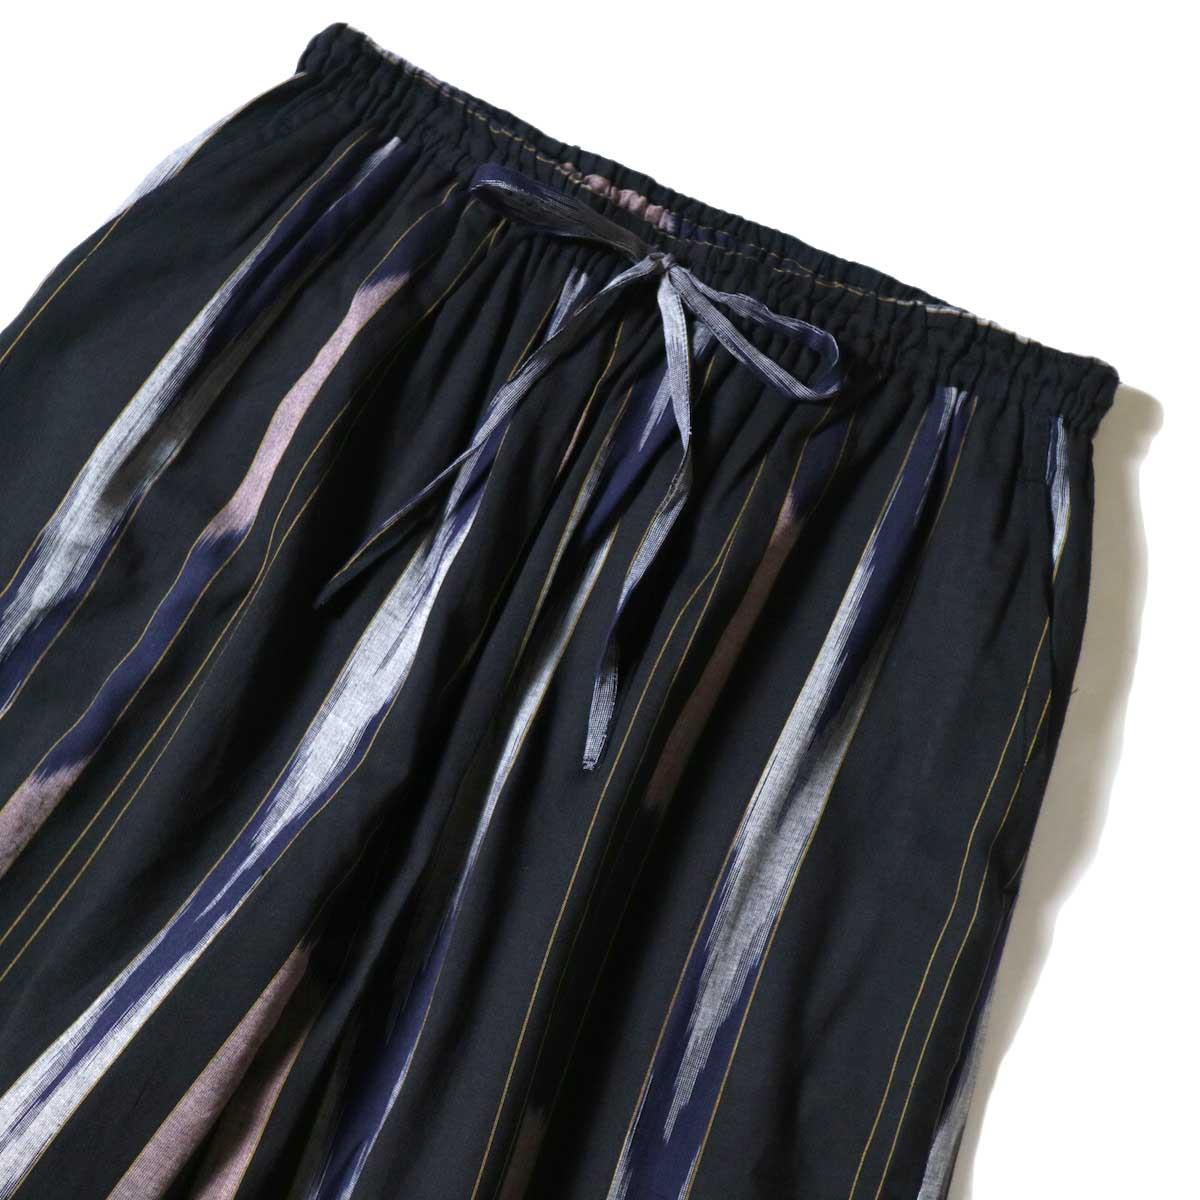 SOIL / WIDE EASY PANTS (Black Base) ウエスト